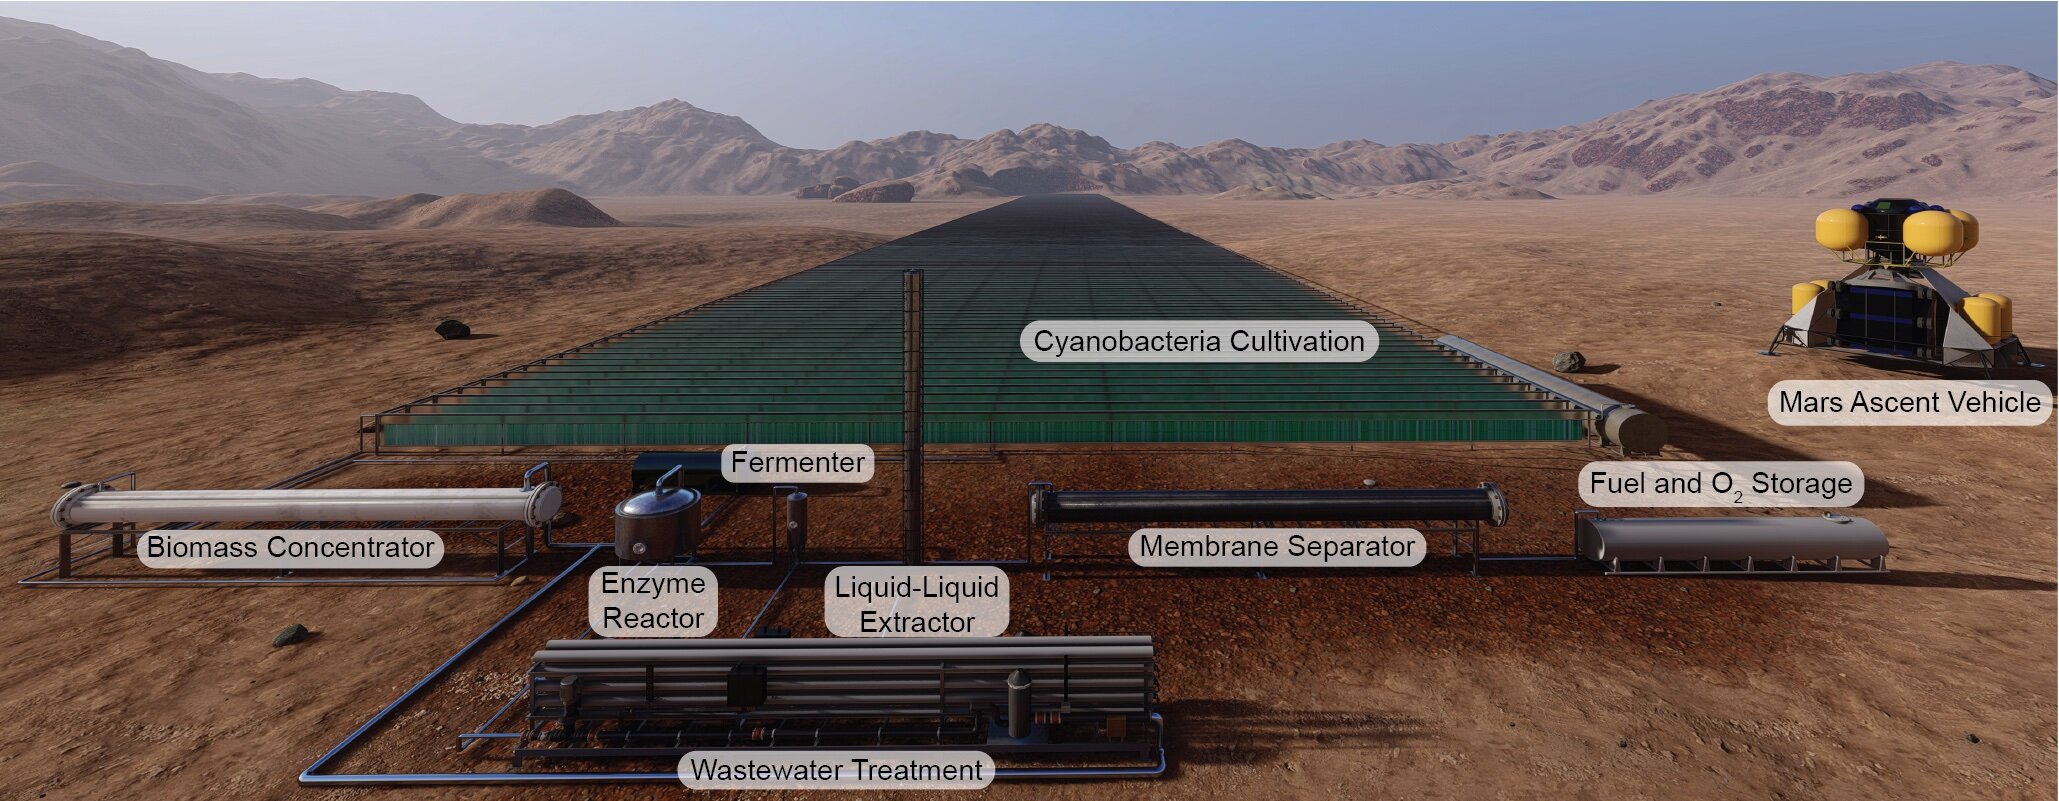 Making Martian rocket biofuel on Mars